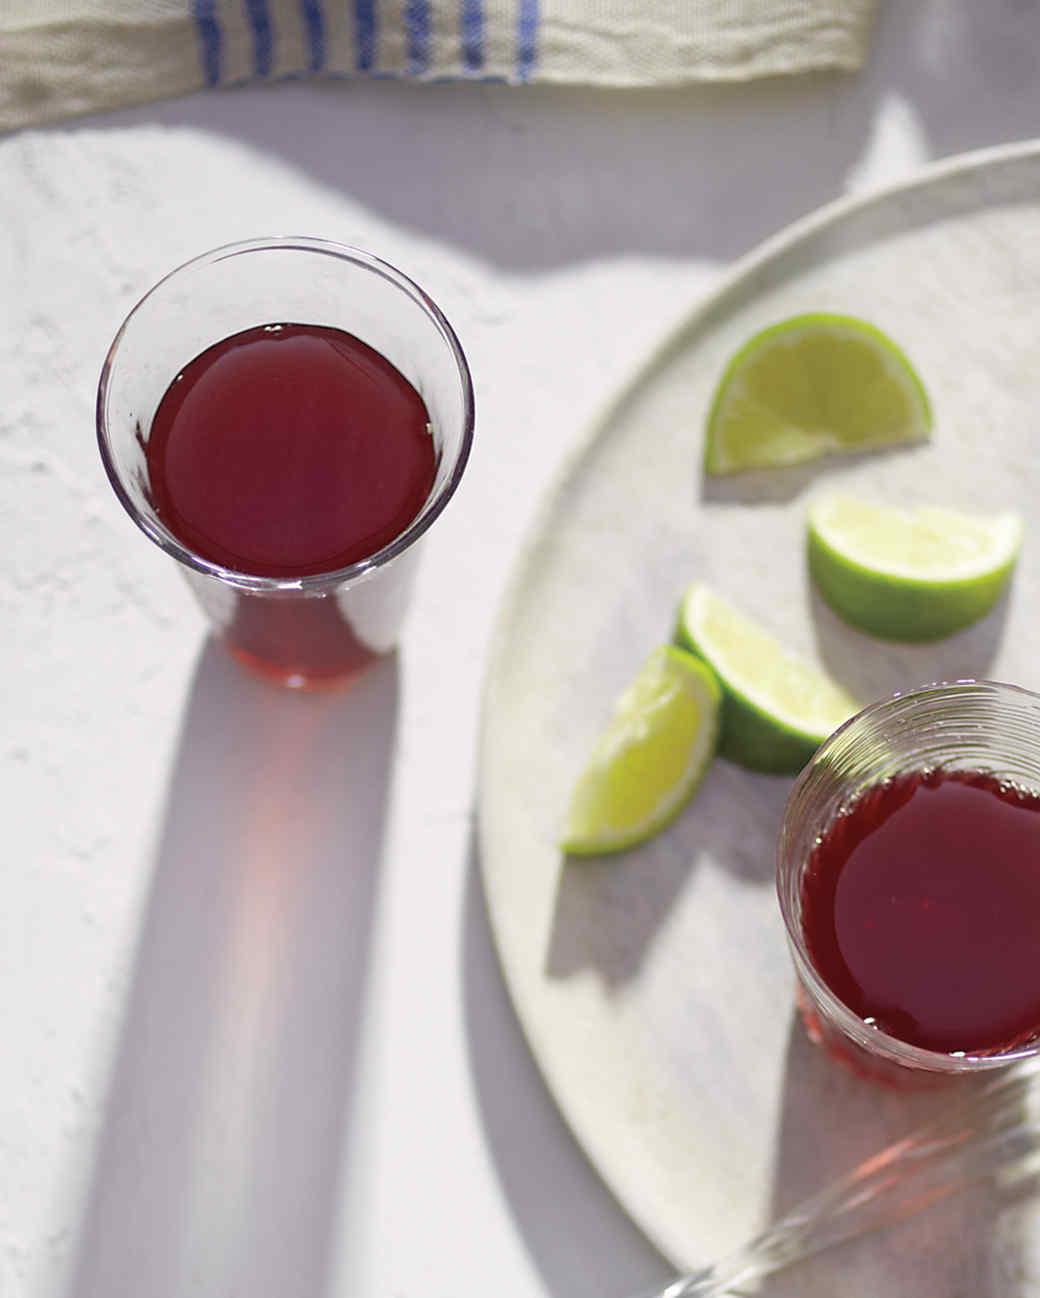 hibiscus-tea-lime-mbd108831.jpg